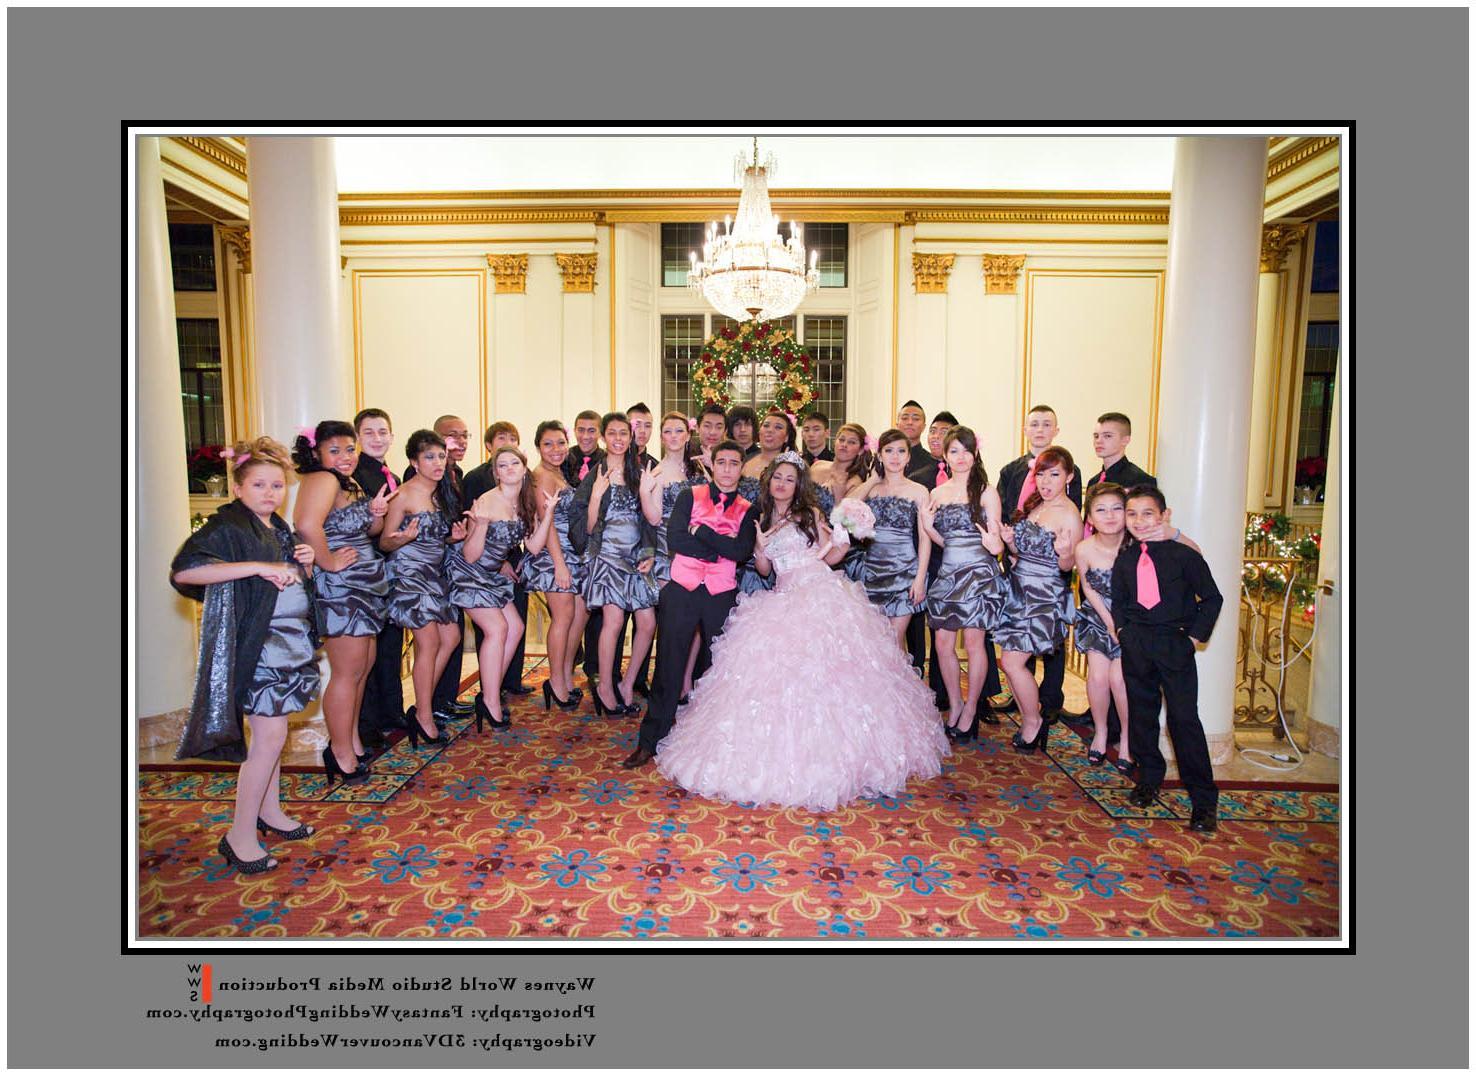 extravagant wedding event